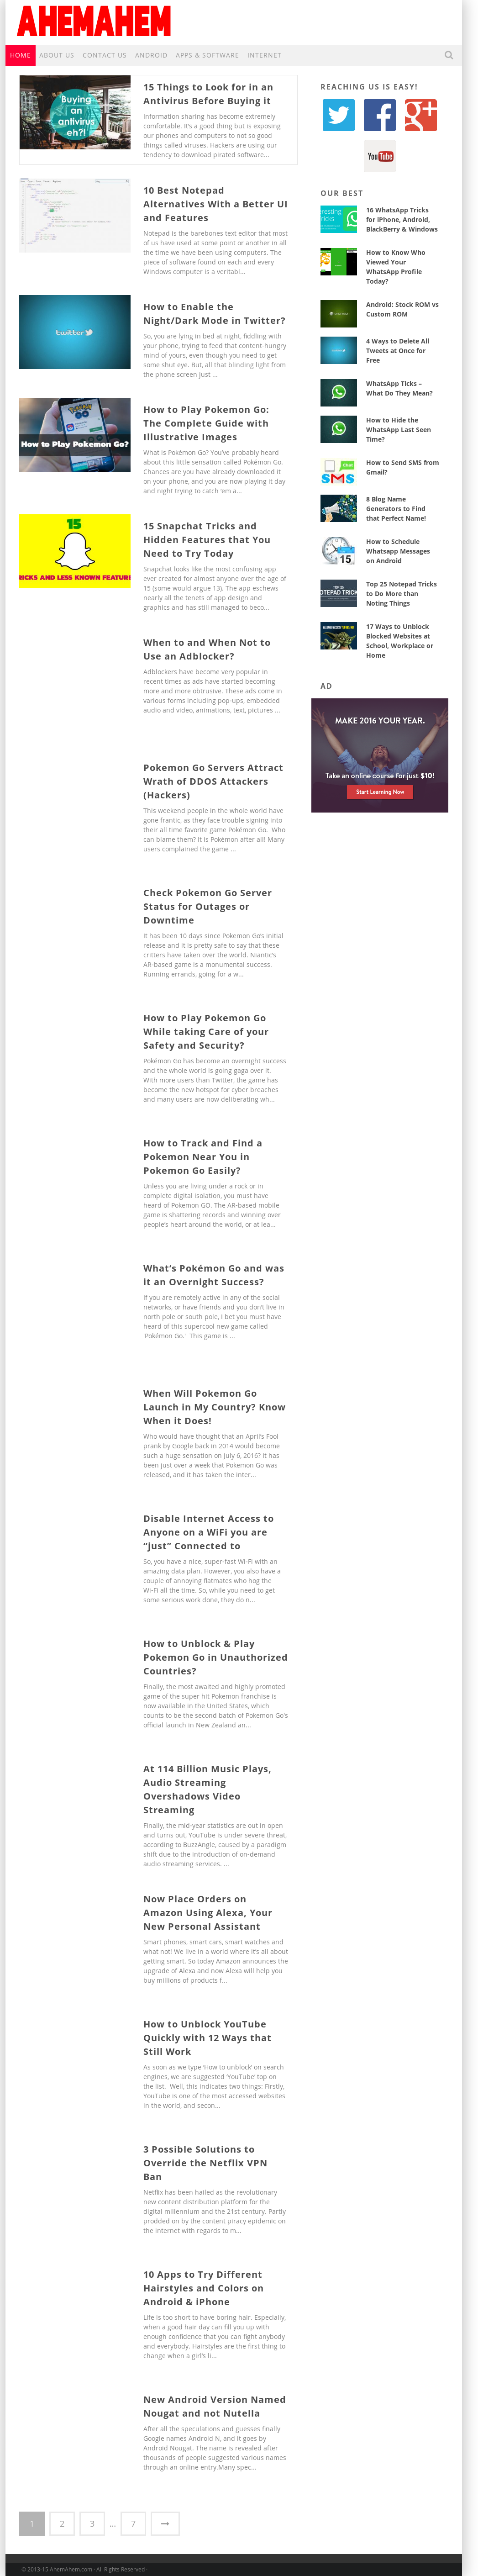 Ahem Ahem Competitors, Revenue and Employees - Owler Company Profile